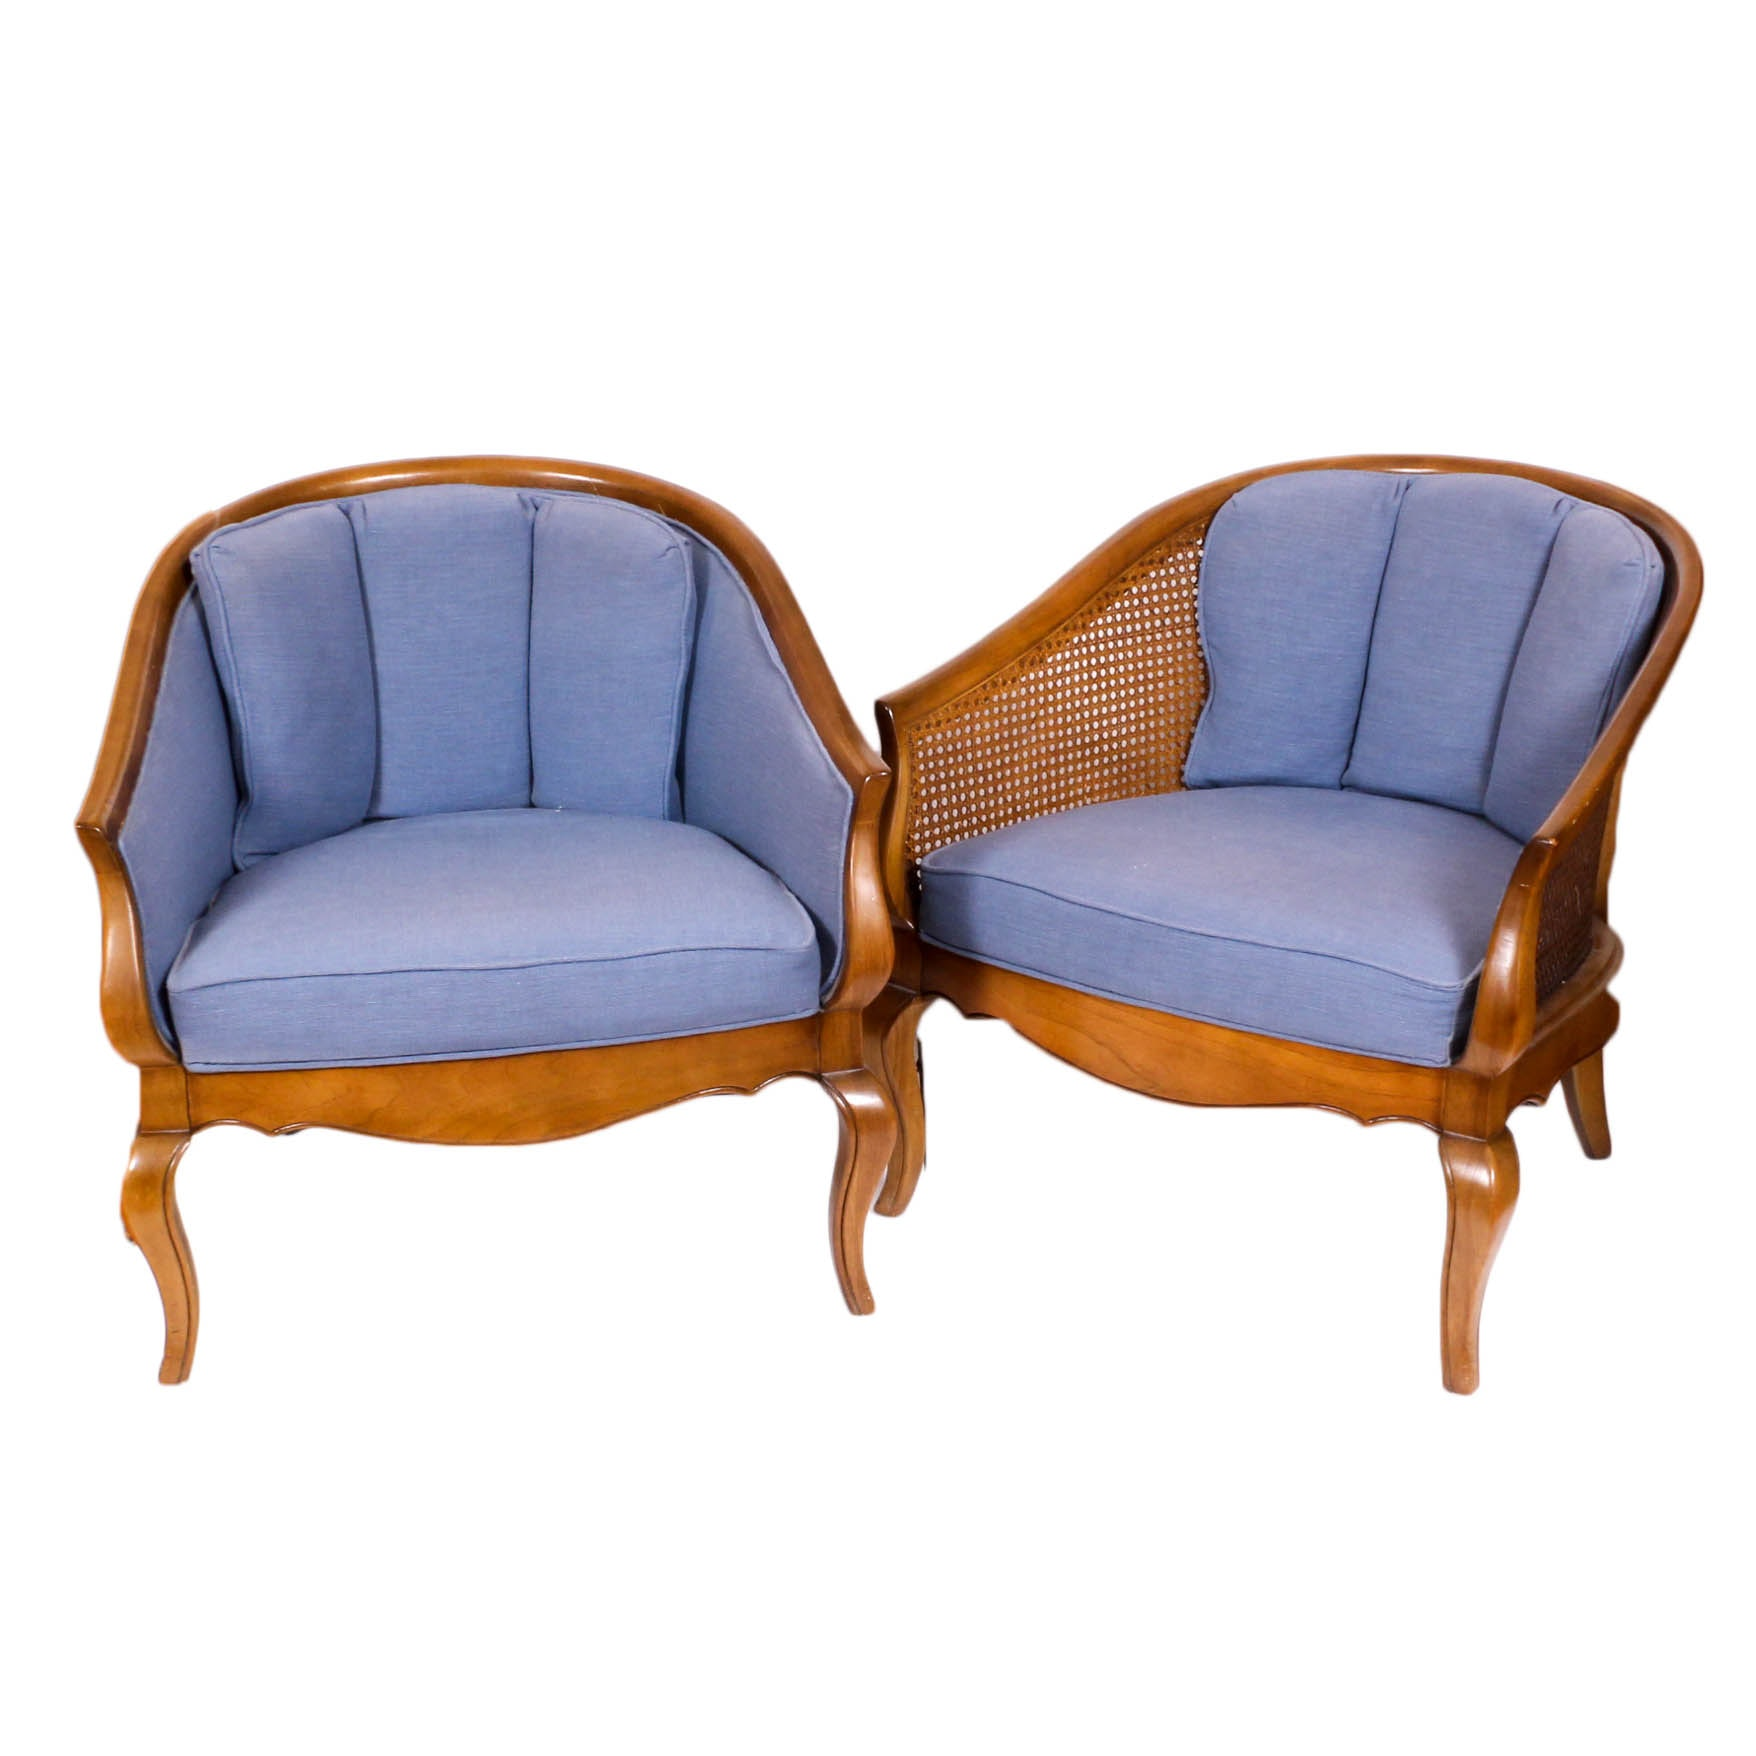 Vintage Barrel Back Armchairs